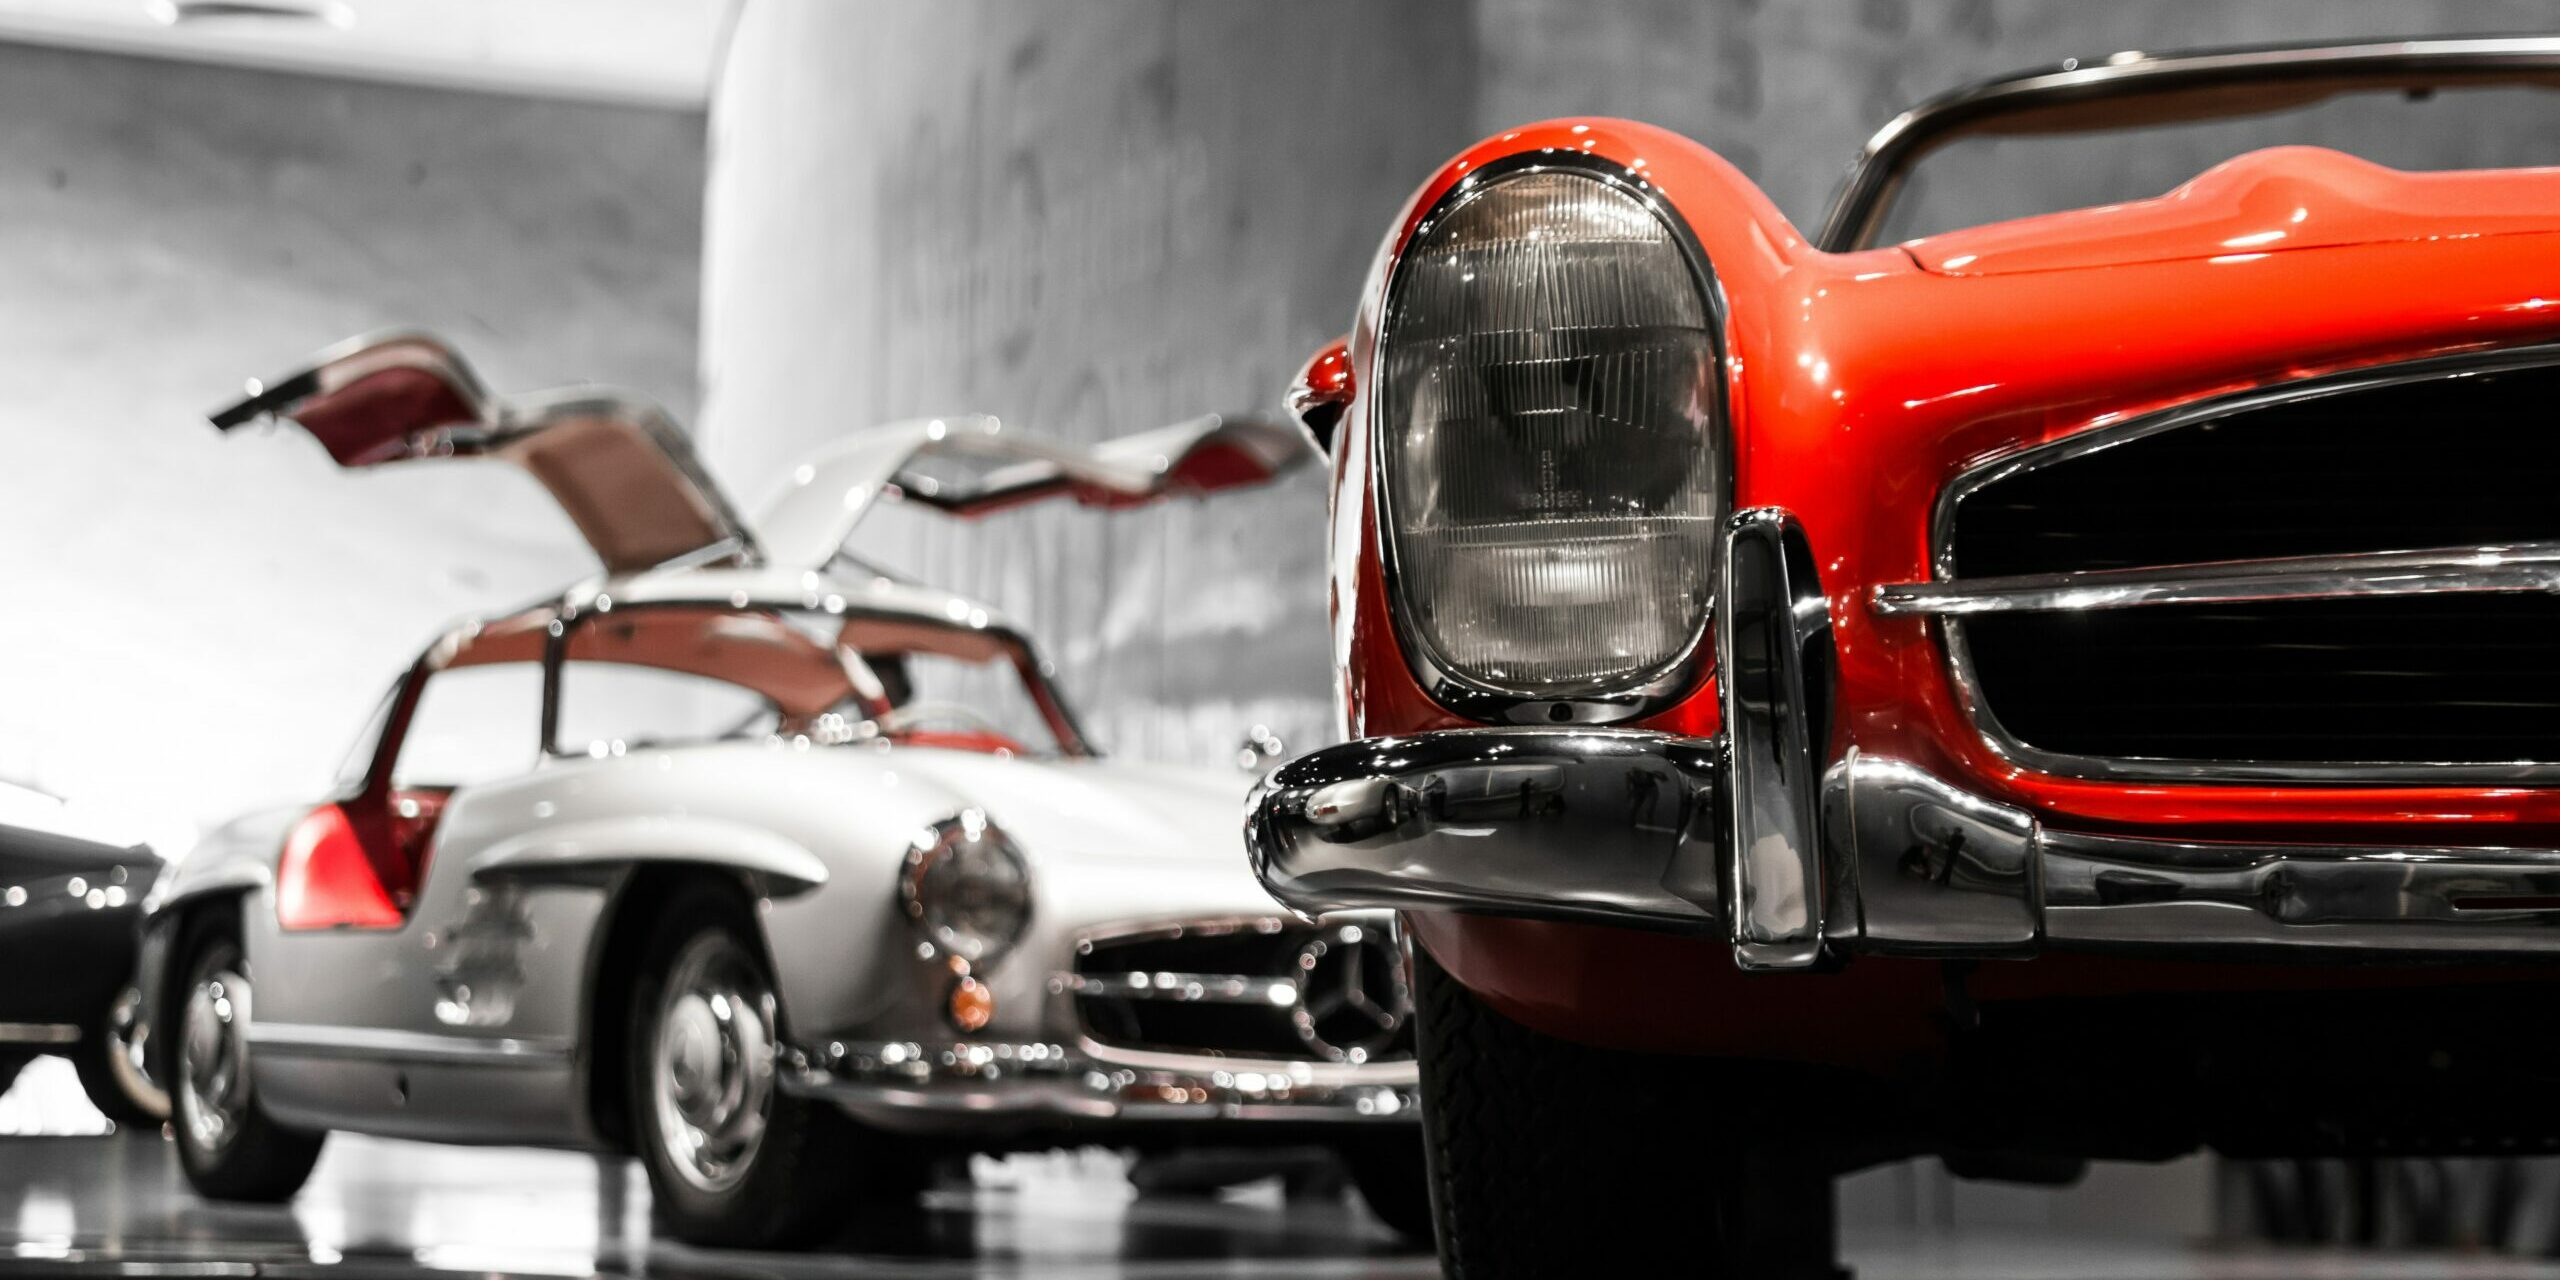 Motoryzacja i biznes